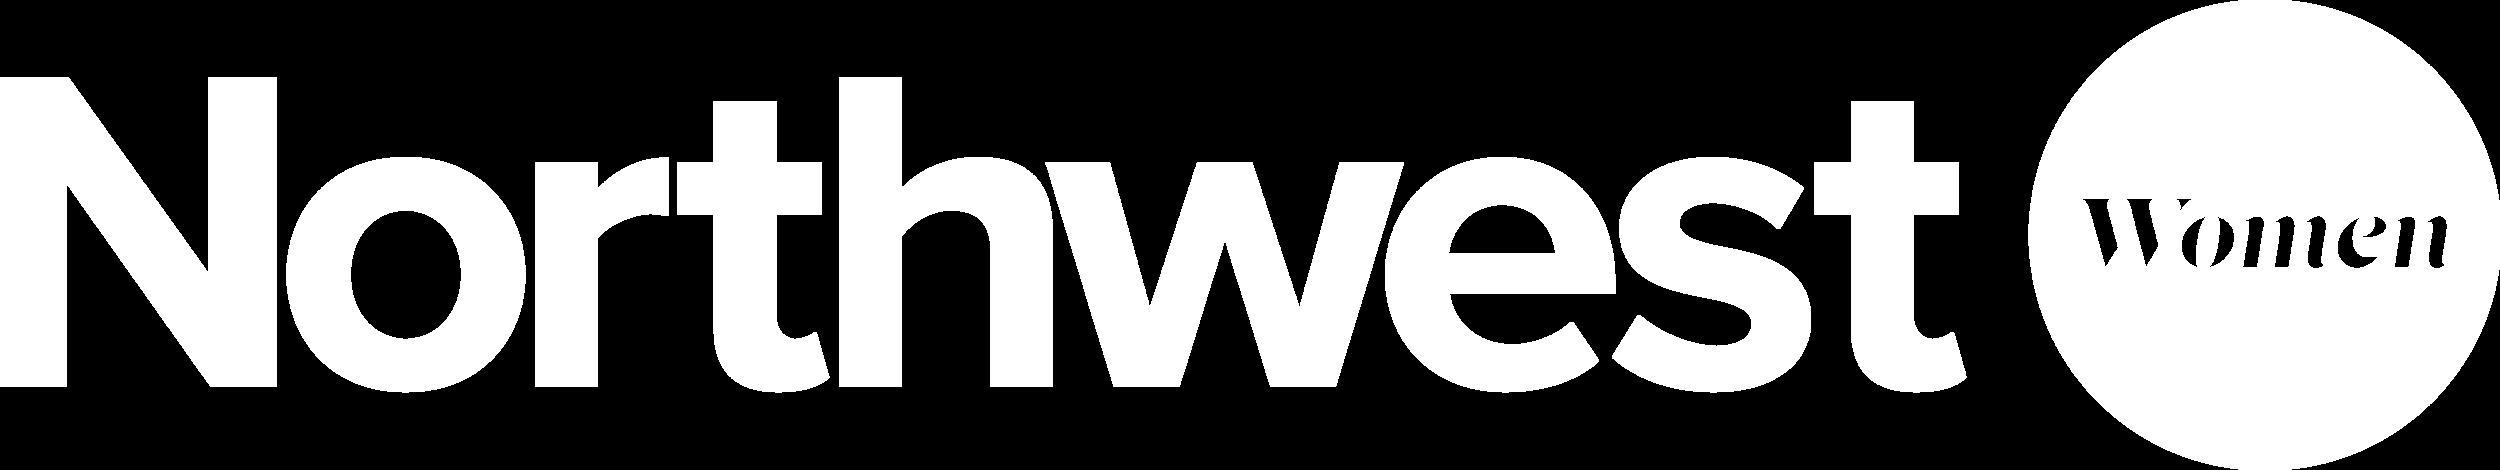 Northwest Women-White.png